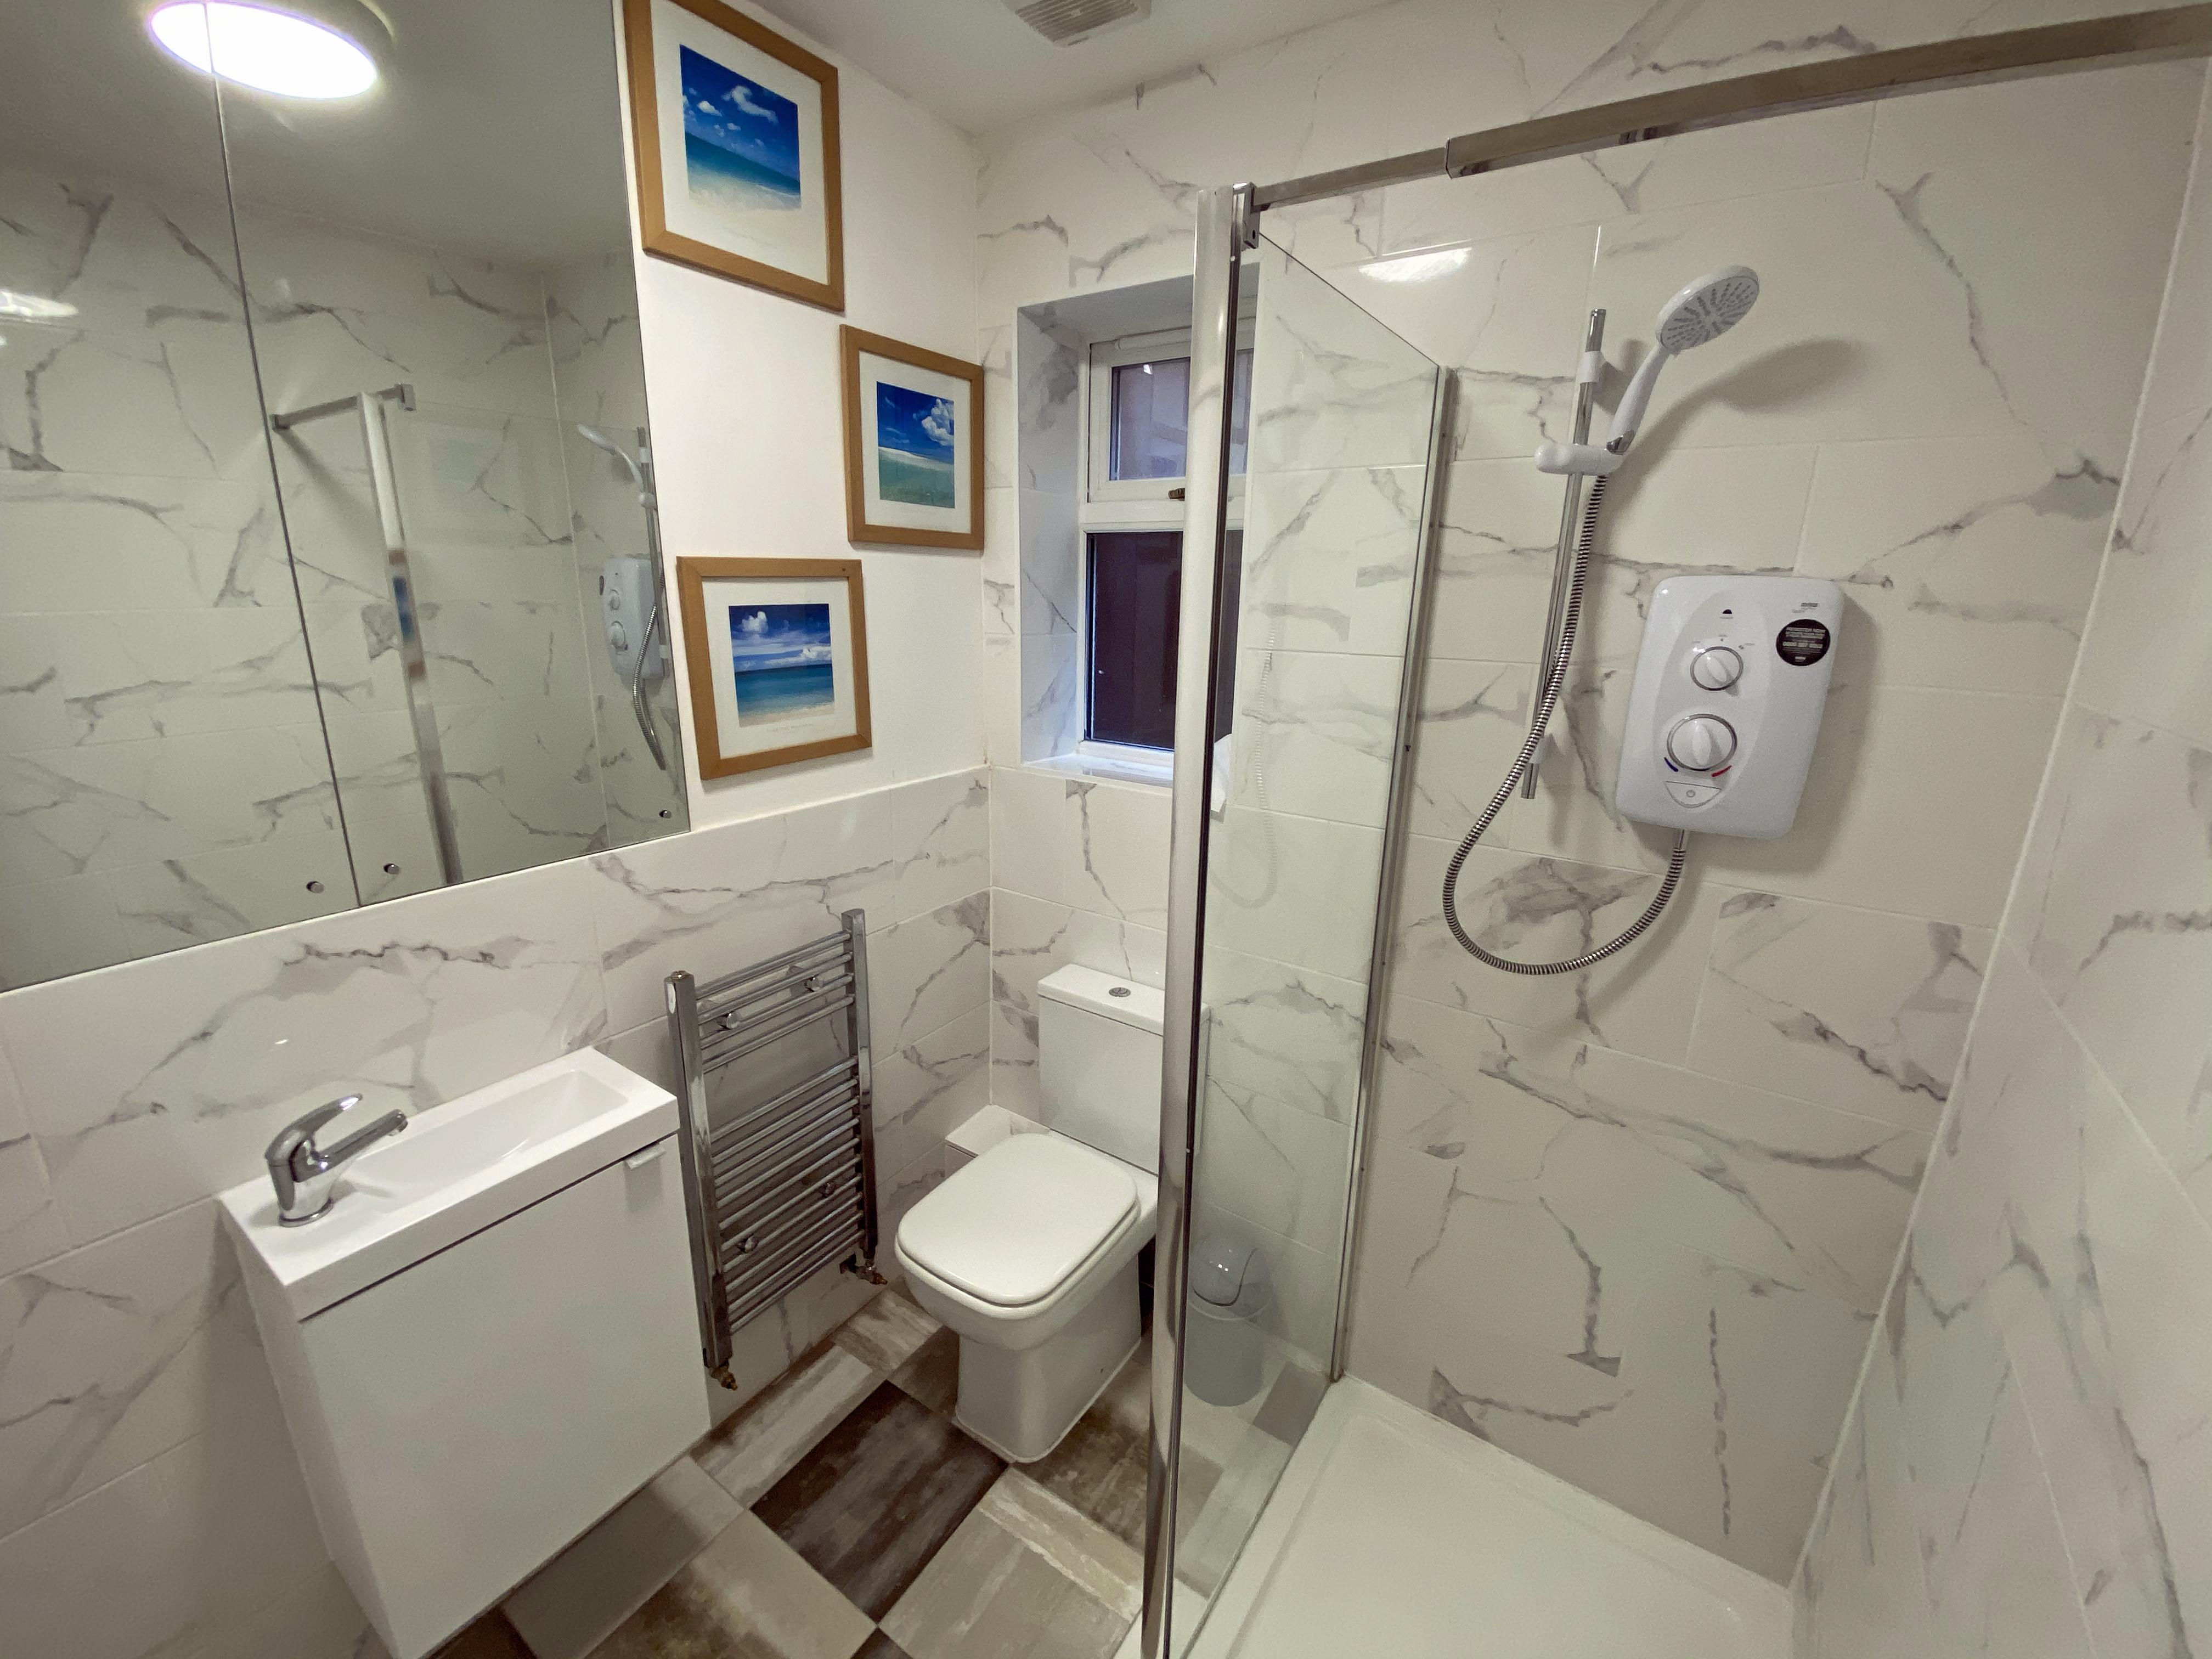 Gound floor bathroom